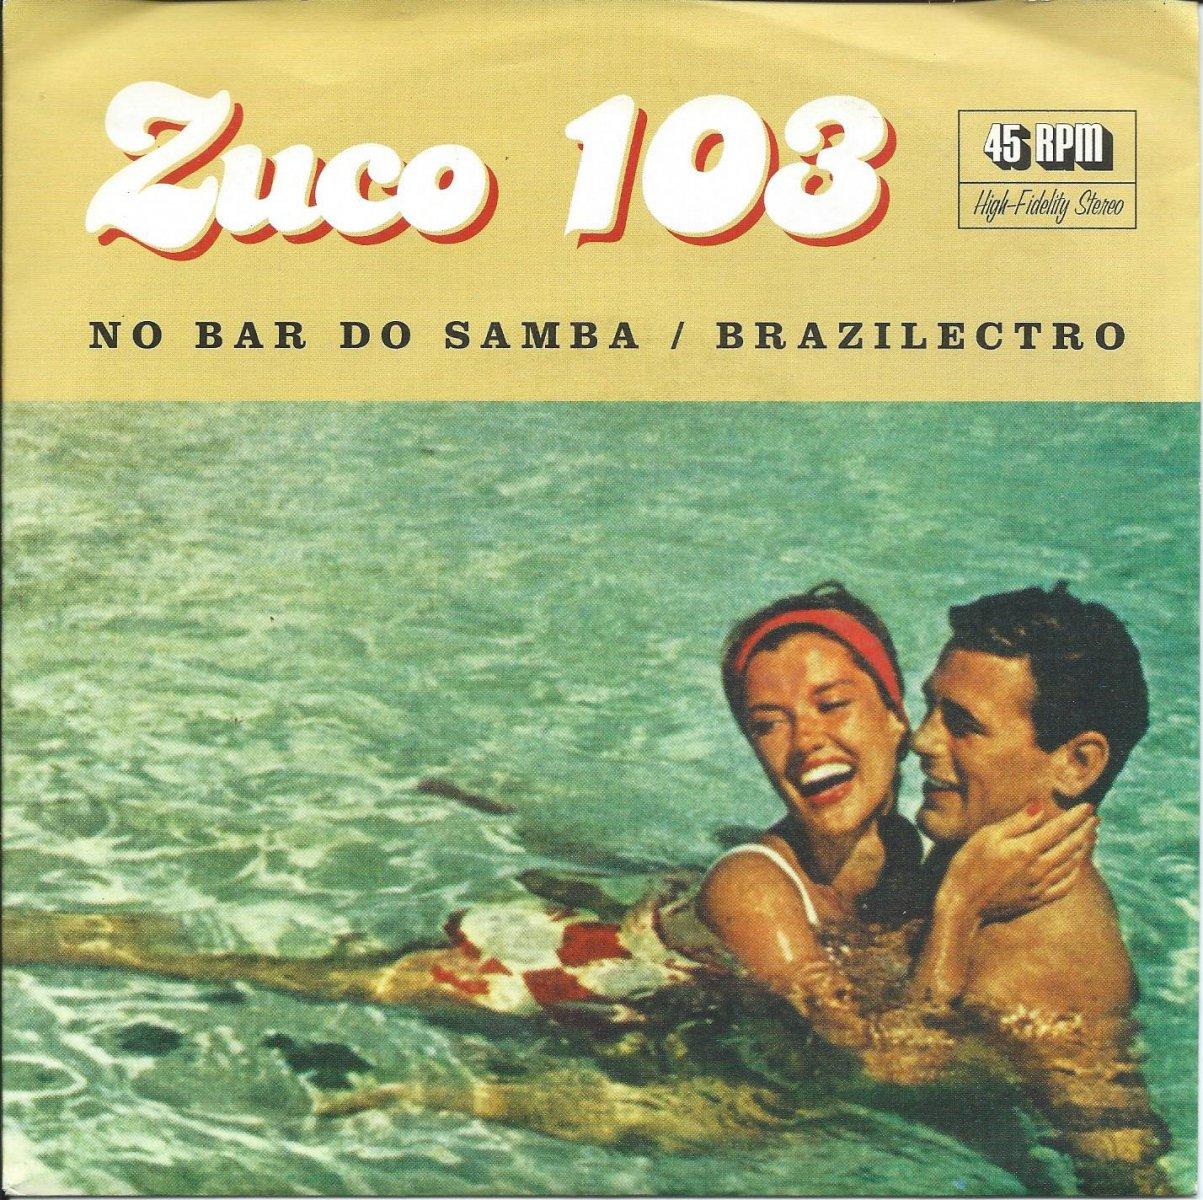 ZUCO 103 / NO BAR DO SAMBA / BRAZILECTRO (7